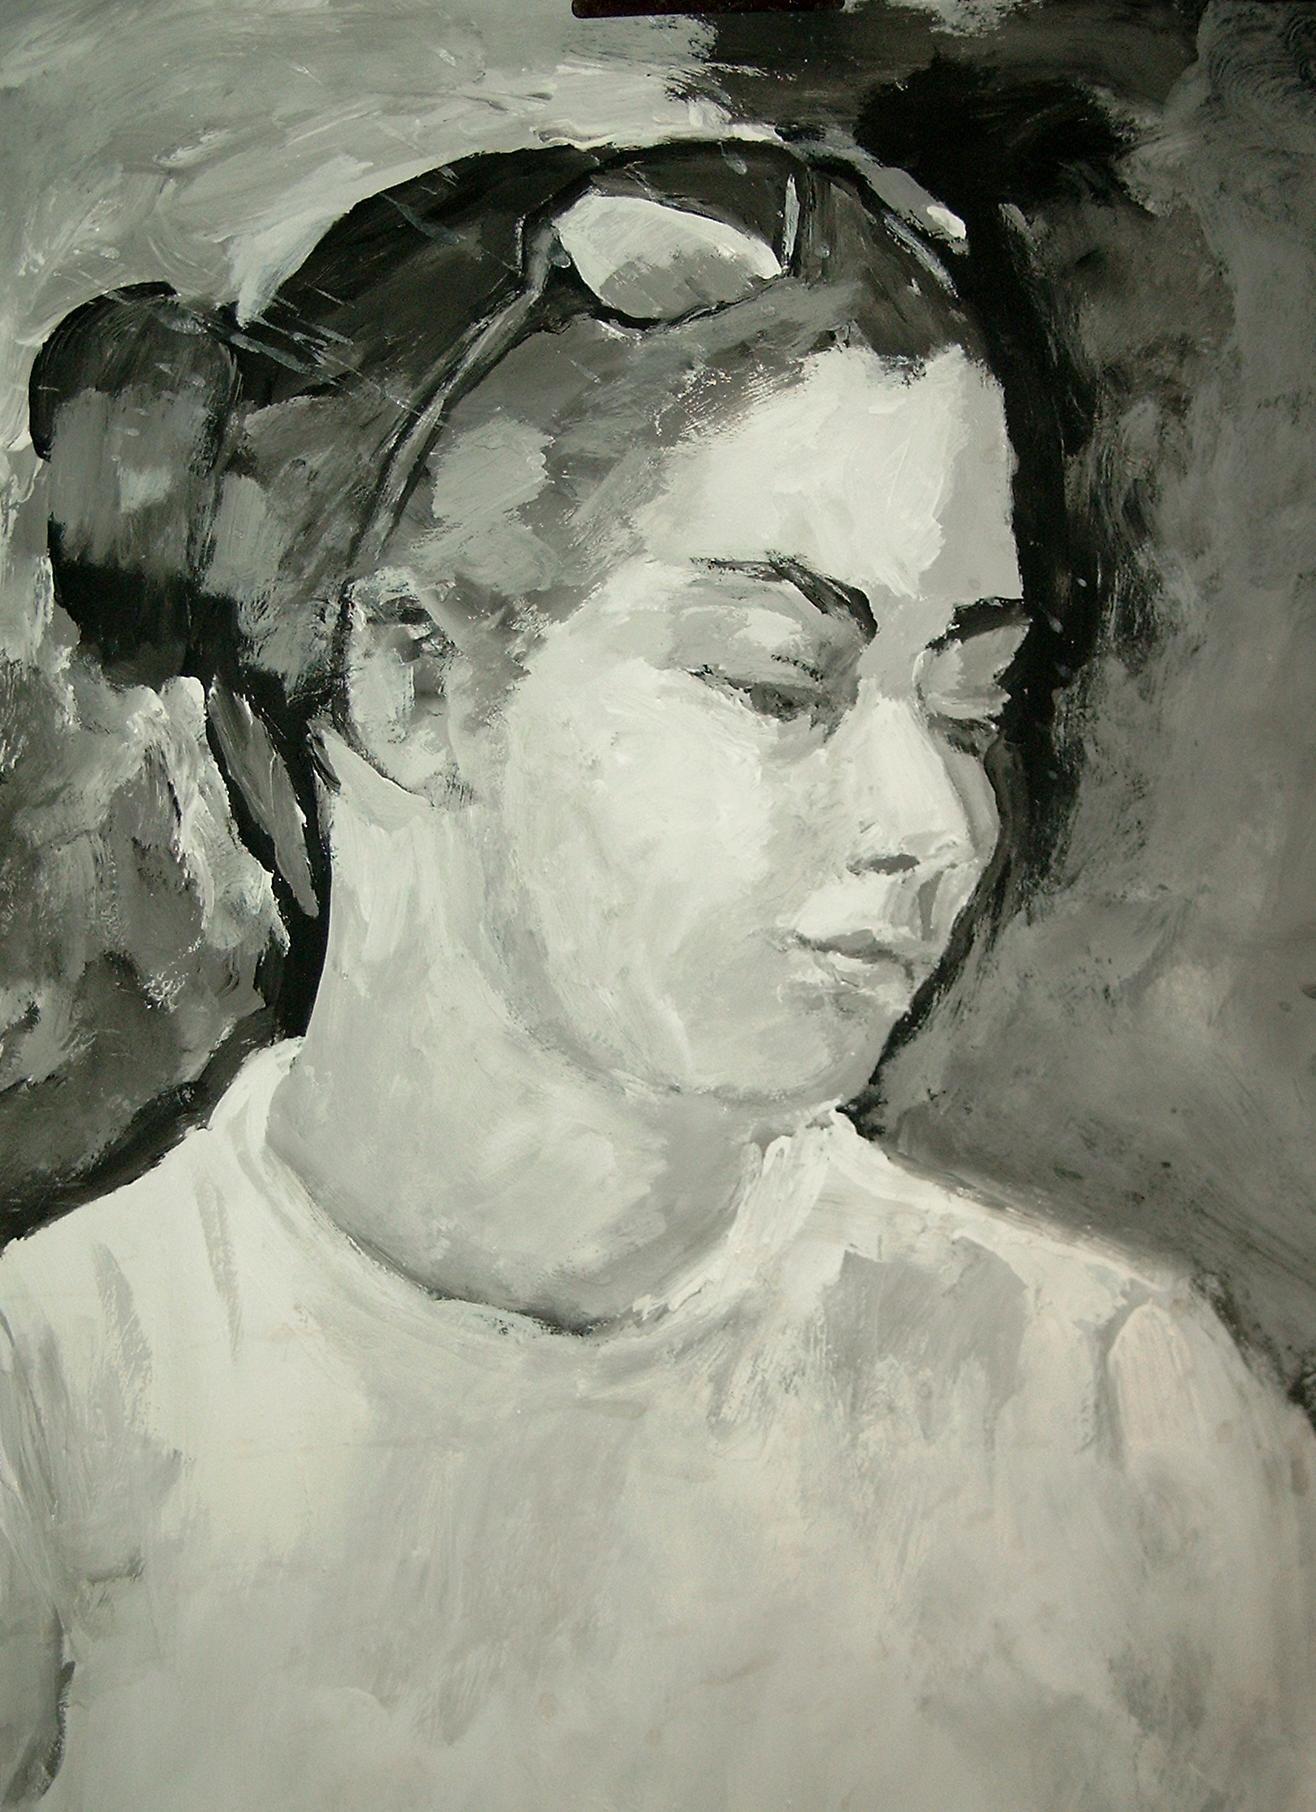 Acryl s/w - Porträt junge Frau 3 - v. skonea